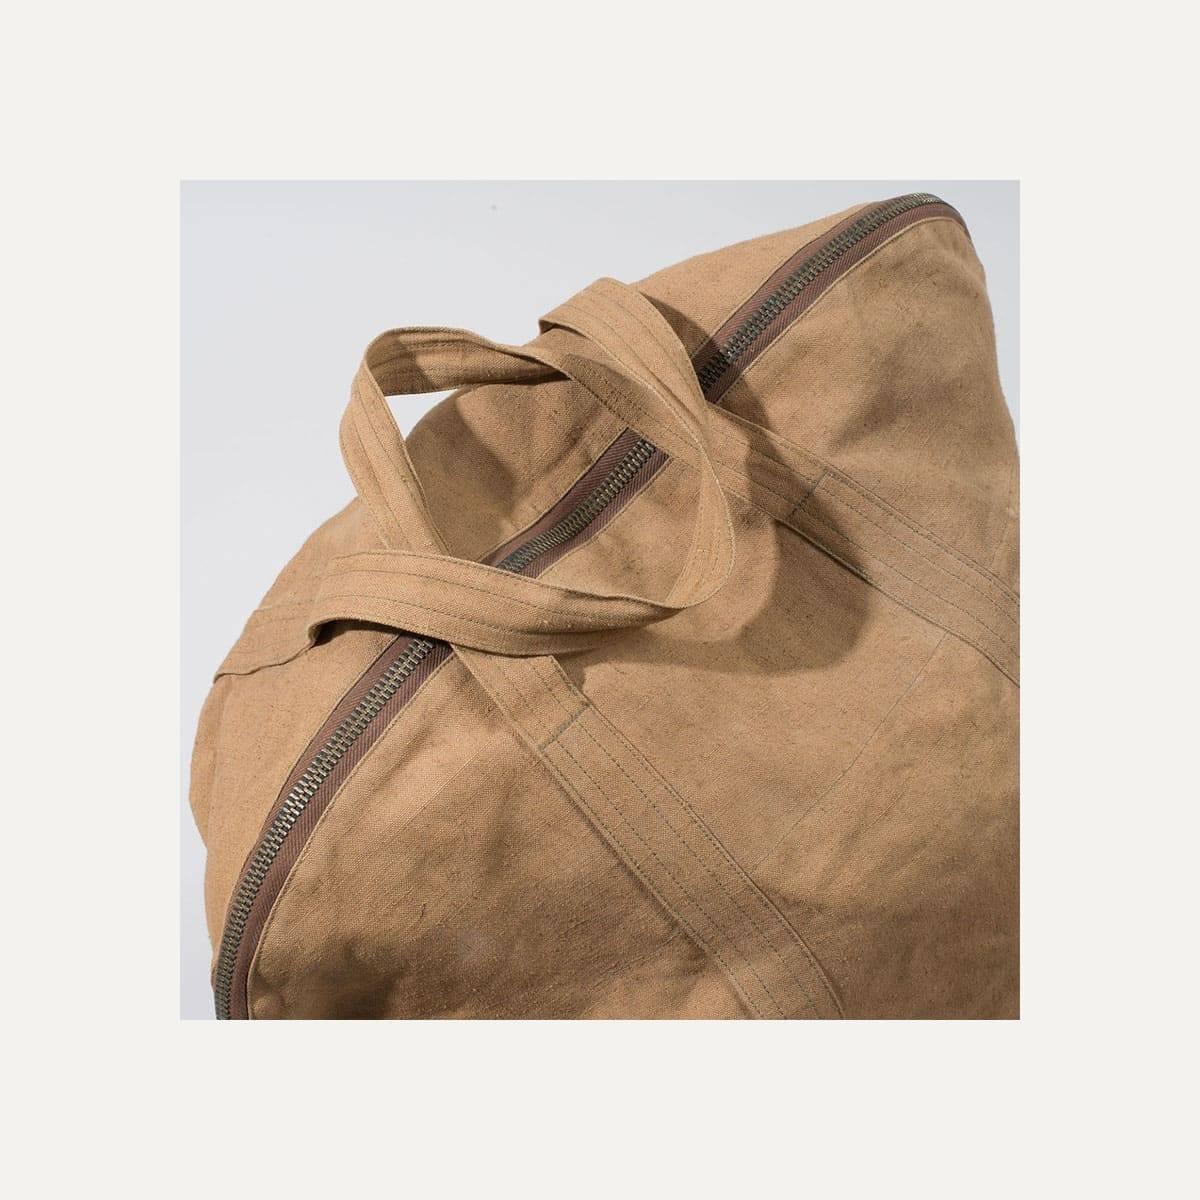 N°4: 'Cashew-colored' linen parachute bag (image n°5)